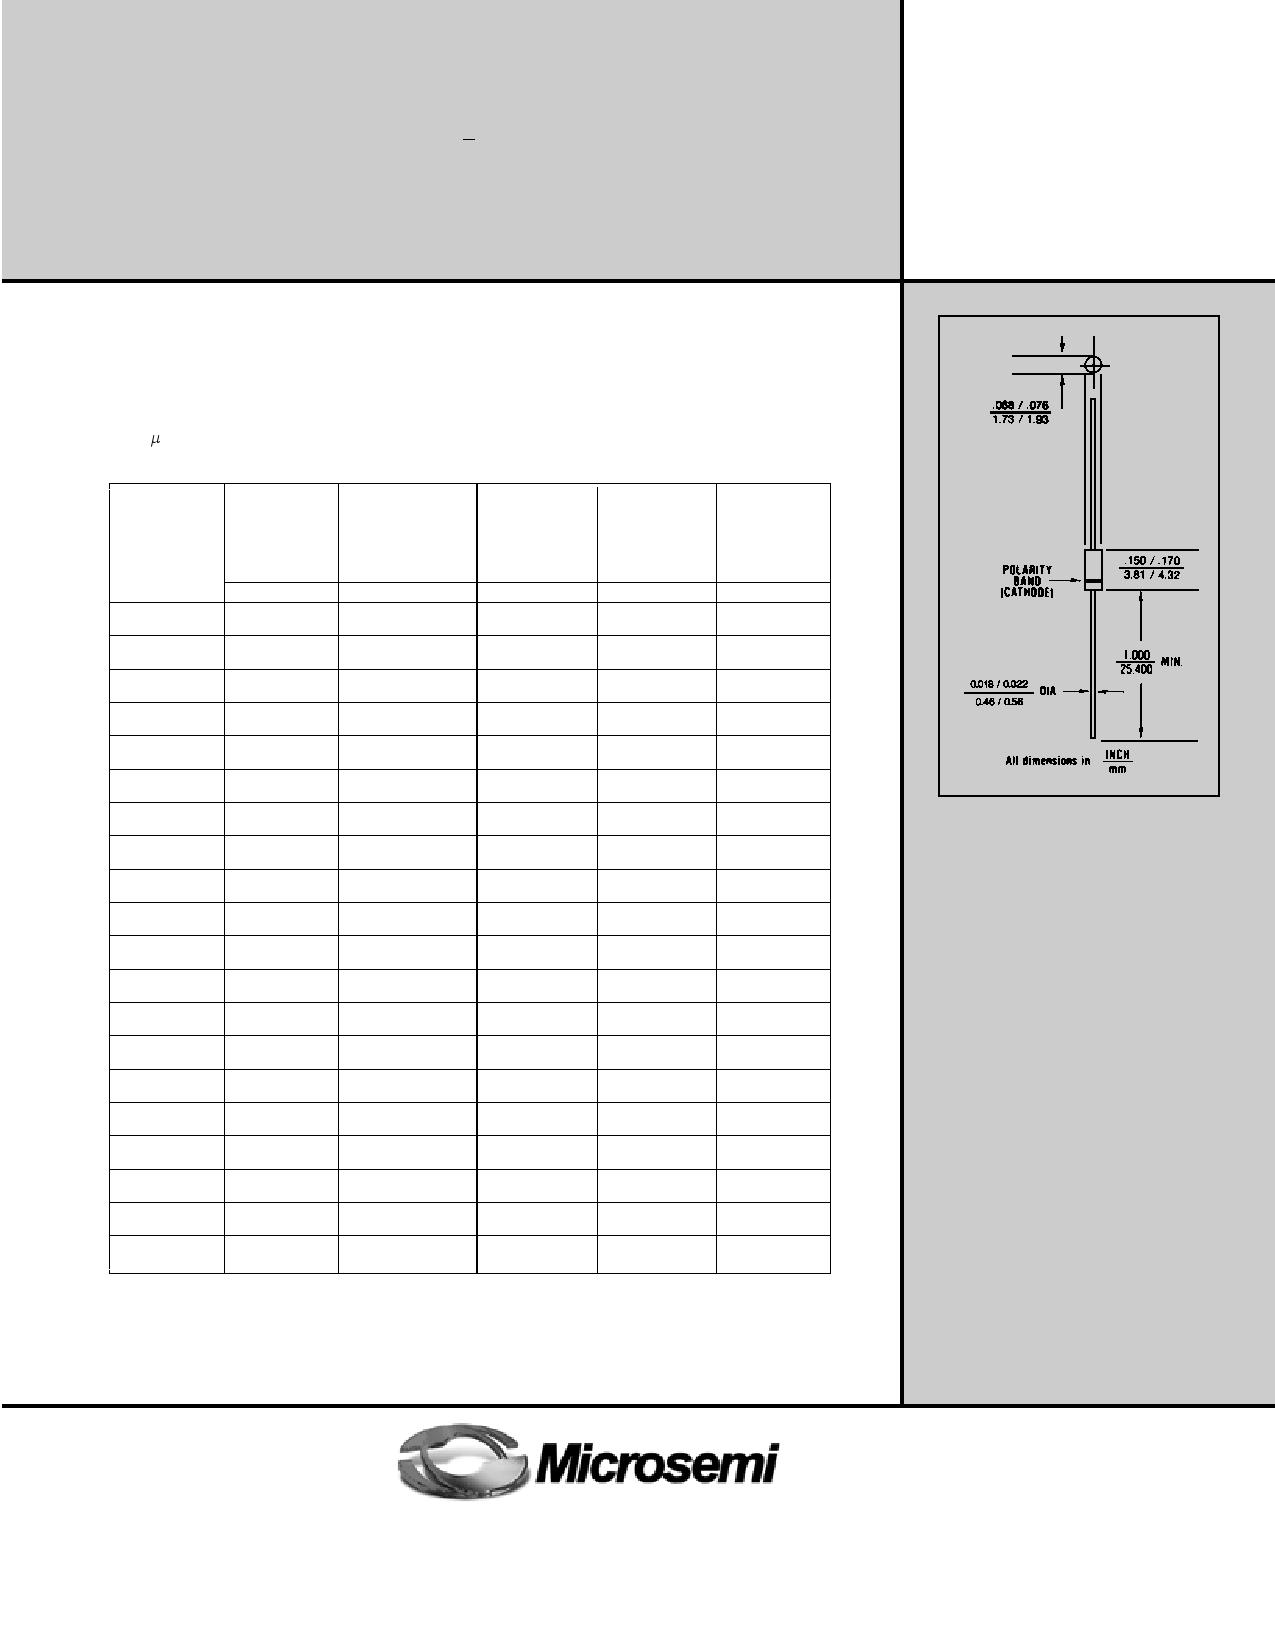 1N4582 datasheet